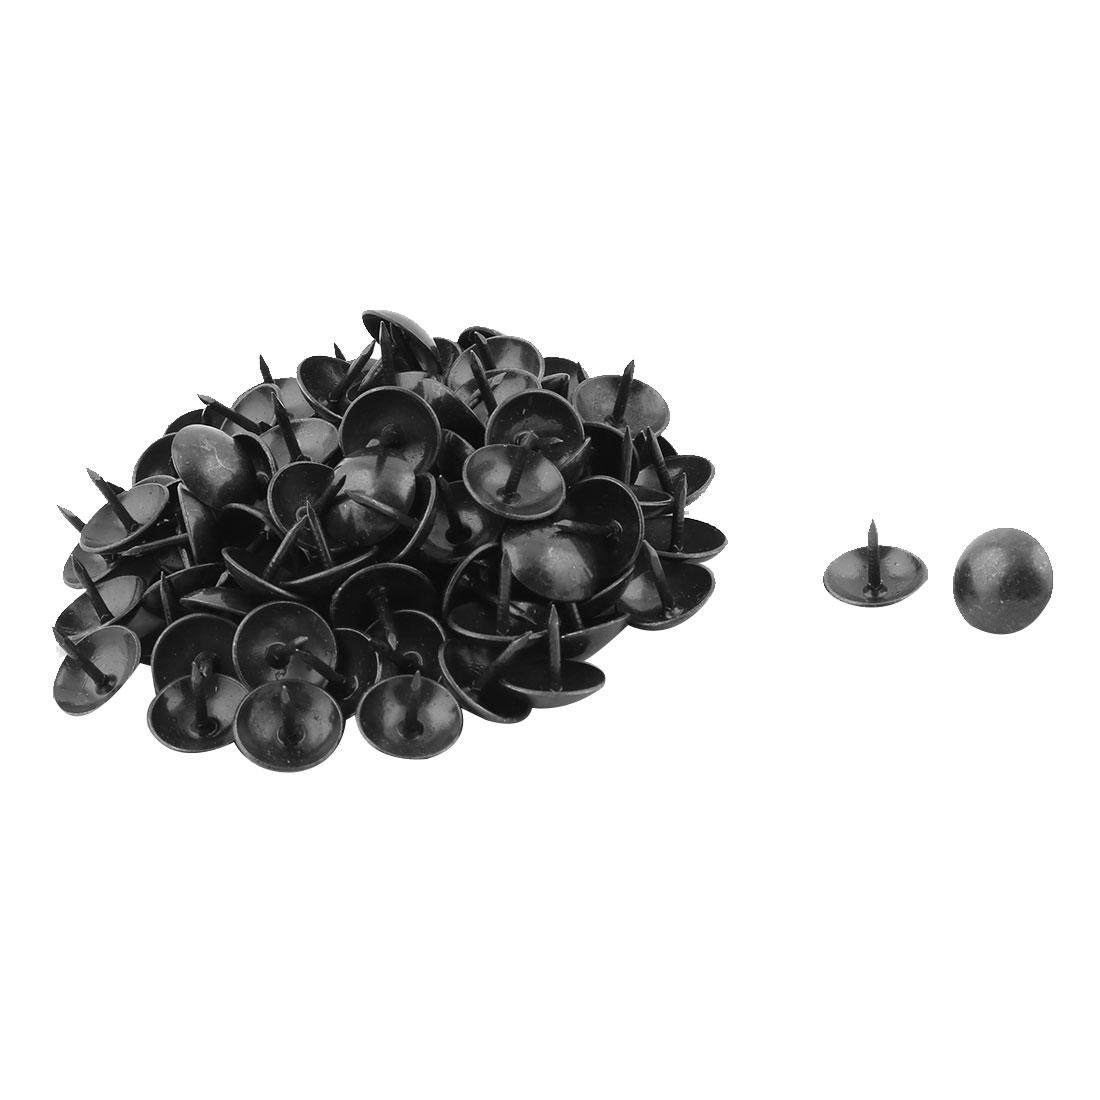 Furniture Box Case Metal Round Cap Upholstery Thumb Tack Nail Pushpin Black 14 x 12mm 100pcs